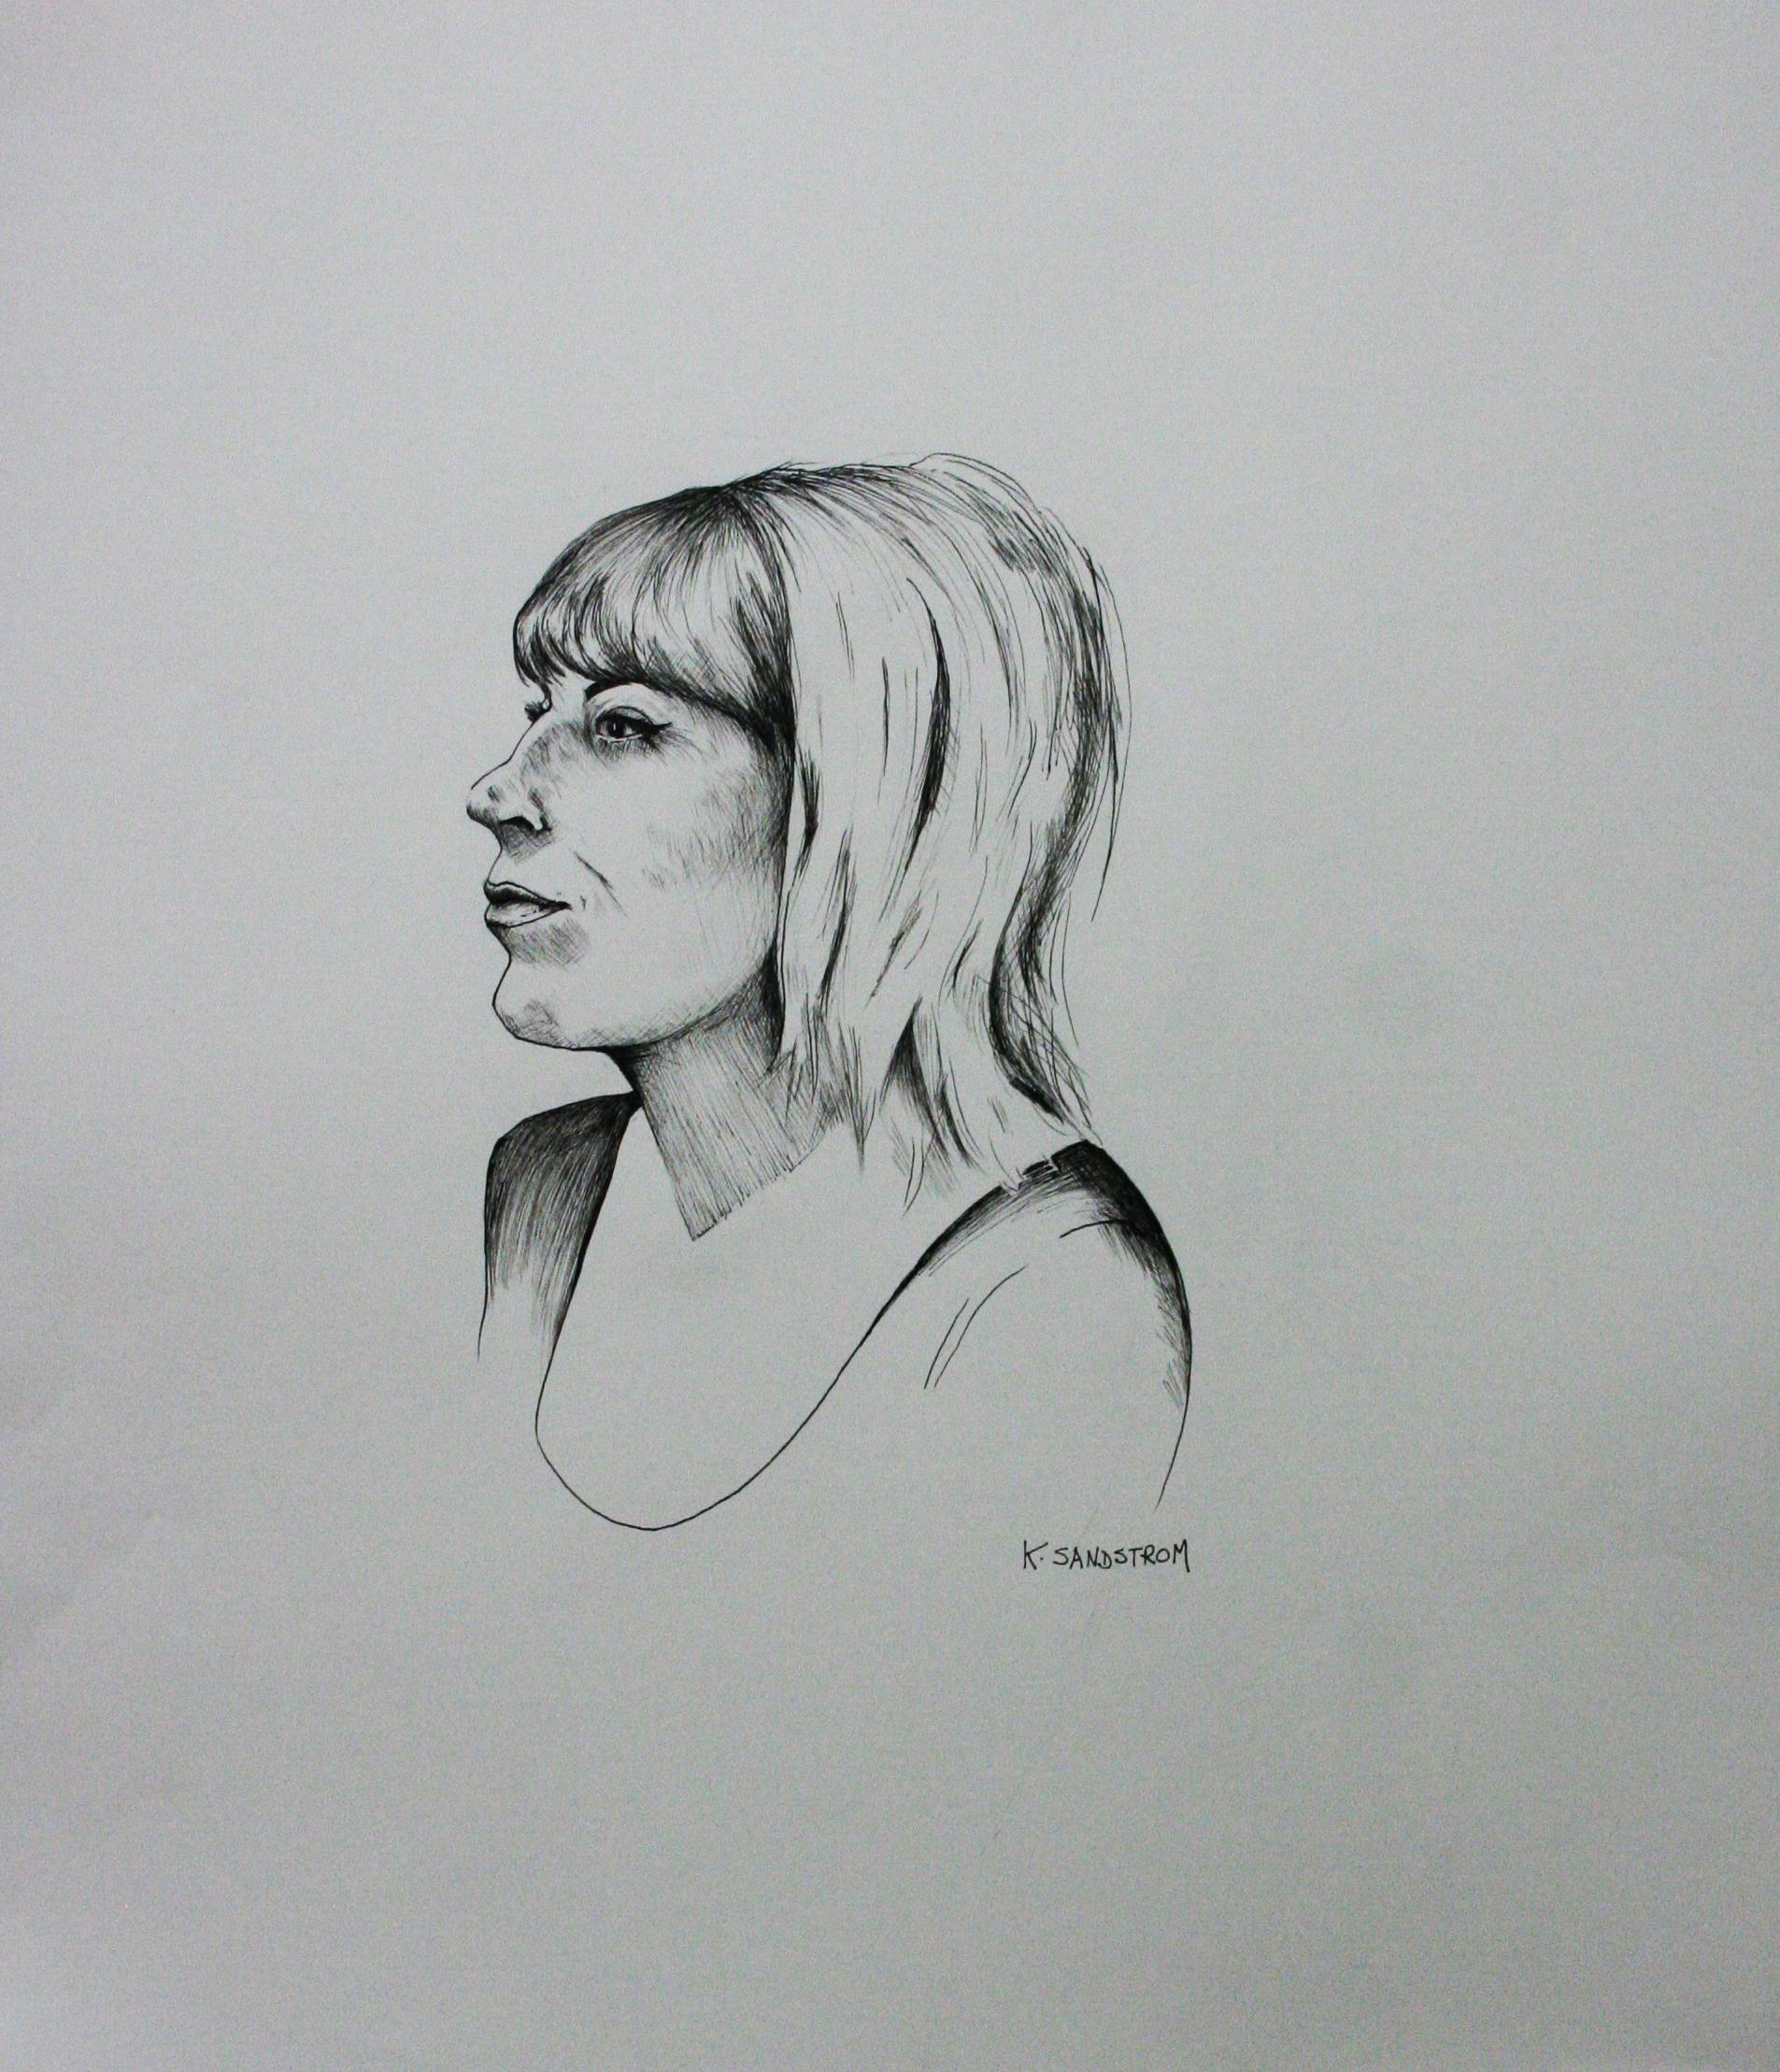 Karen Sandstrom did this 3-hour drawing.